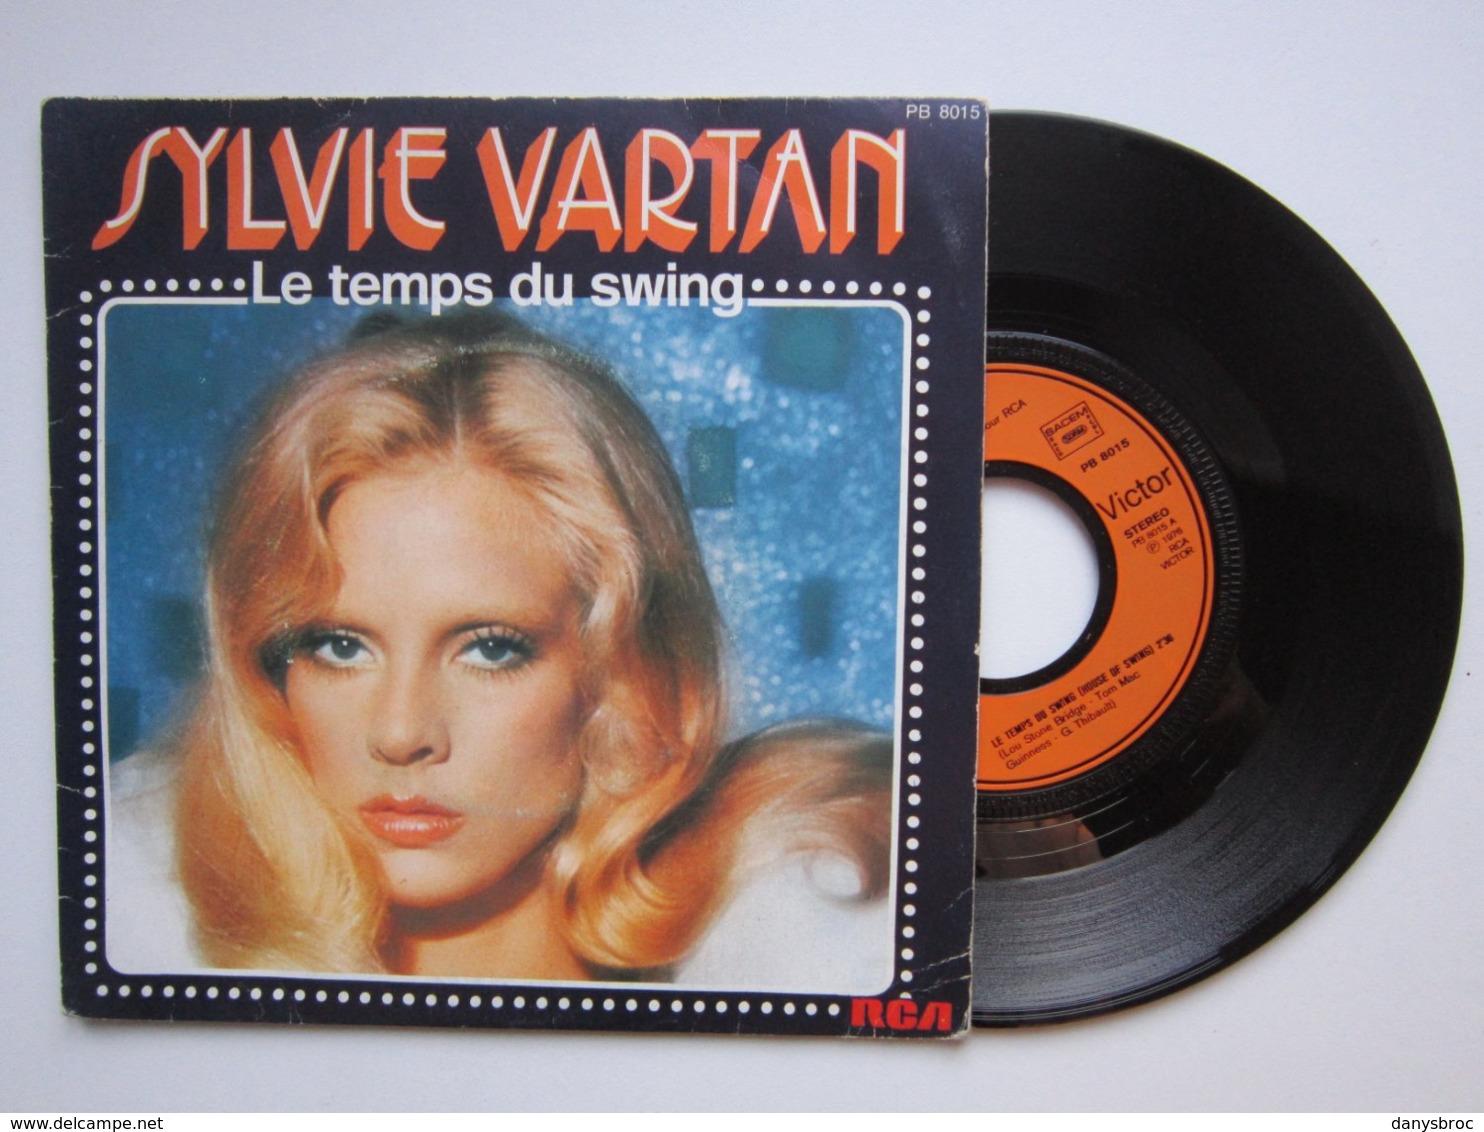 SYLVIE VARTAN / Le Temps Du Swing (house Of Swing) / Dieu Merci (si, Ci Sto) / Disque Vinyle 45t SACEM 1976 - Collector's Editions